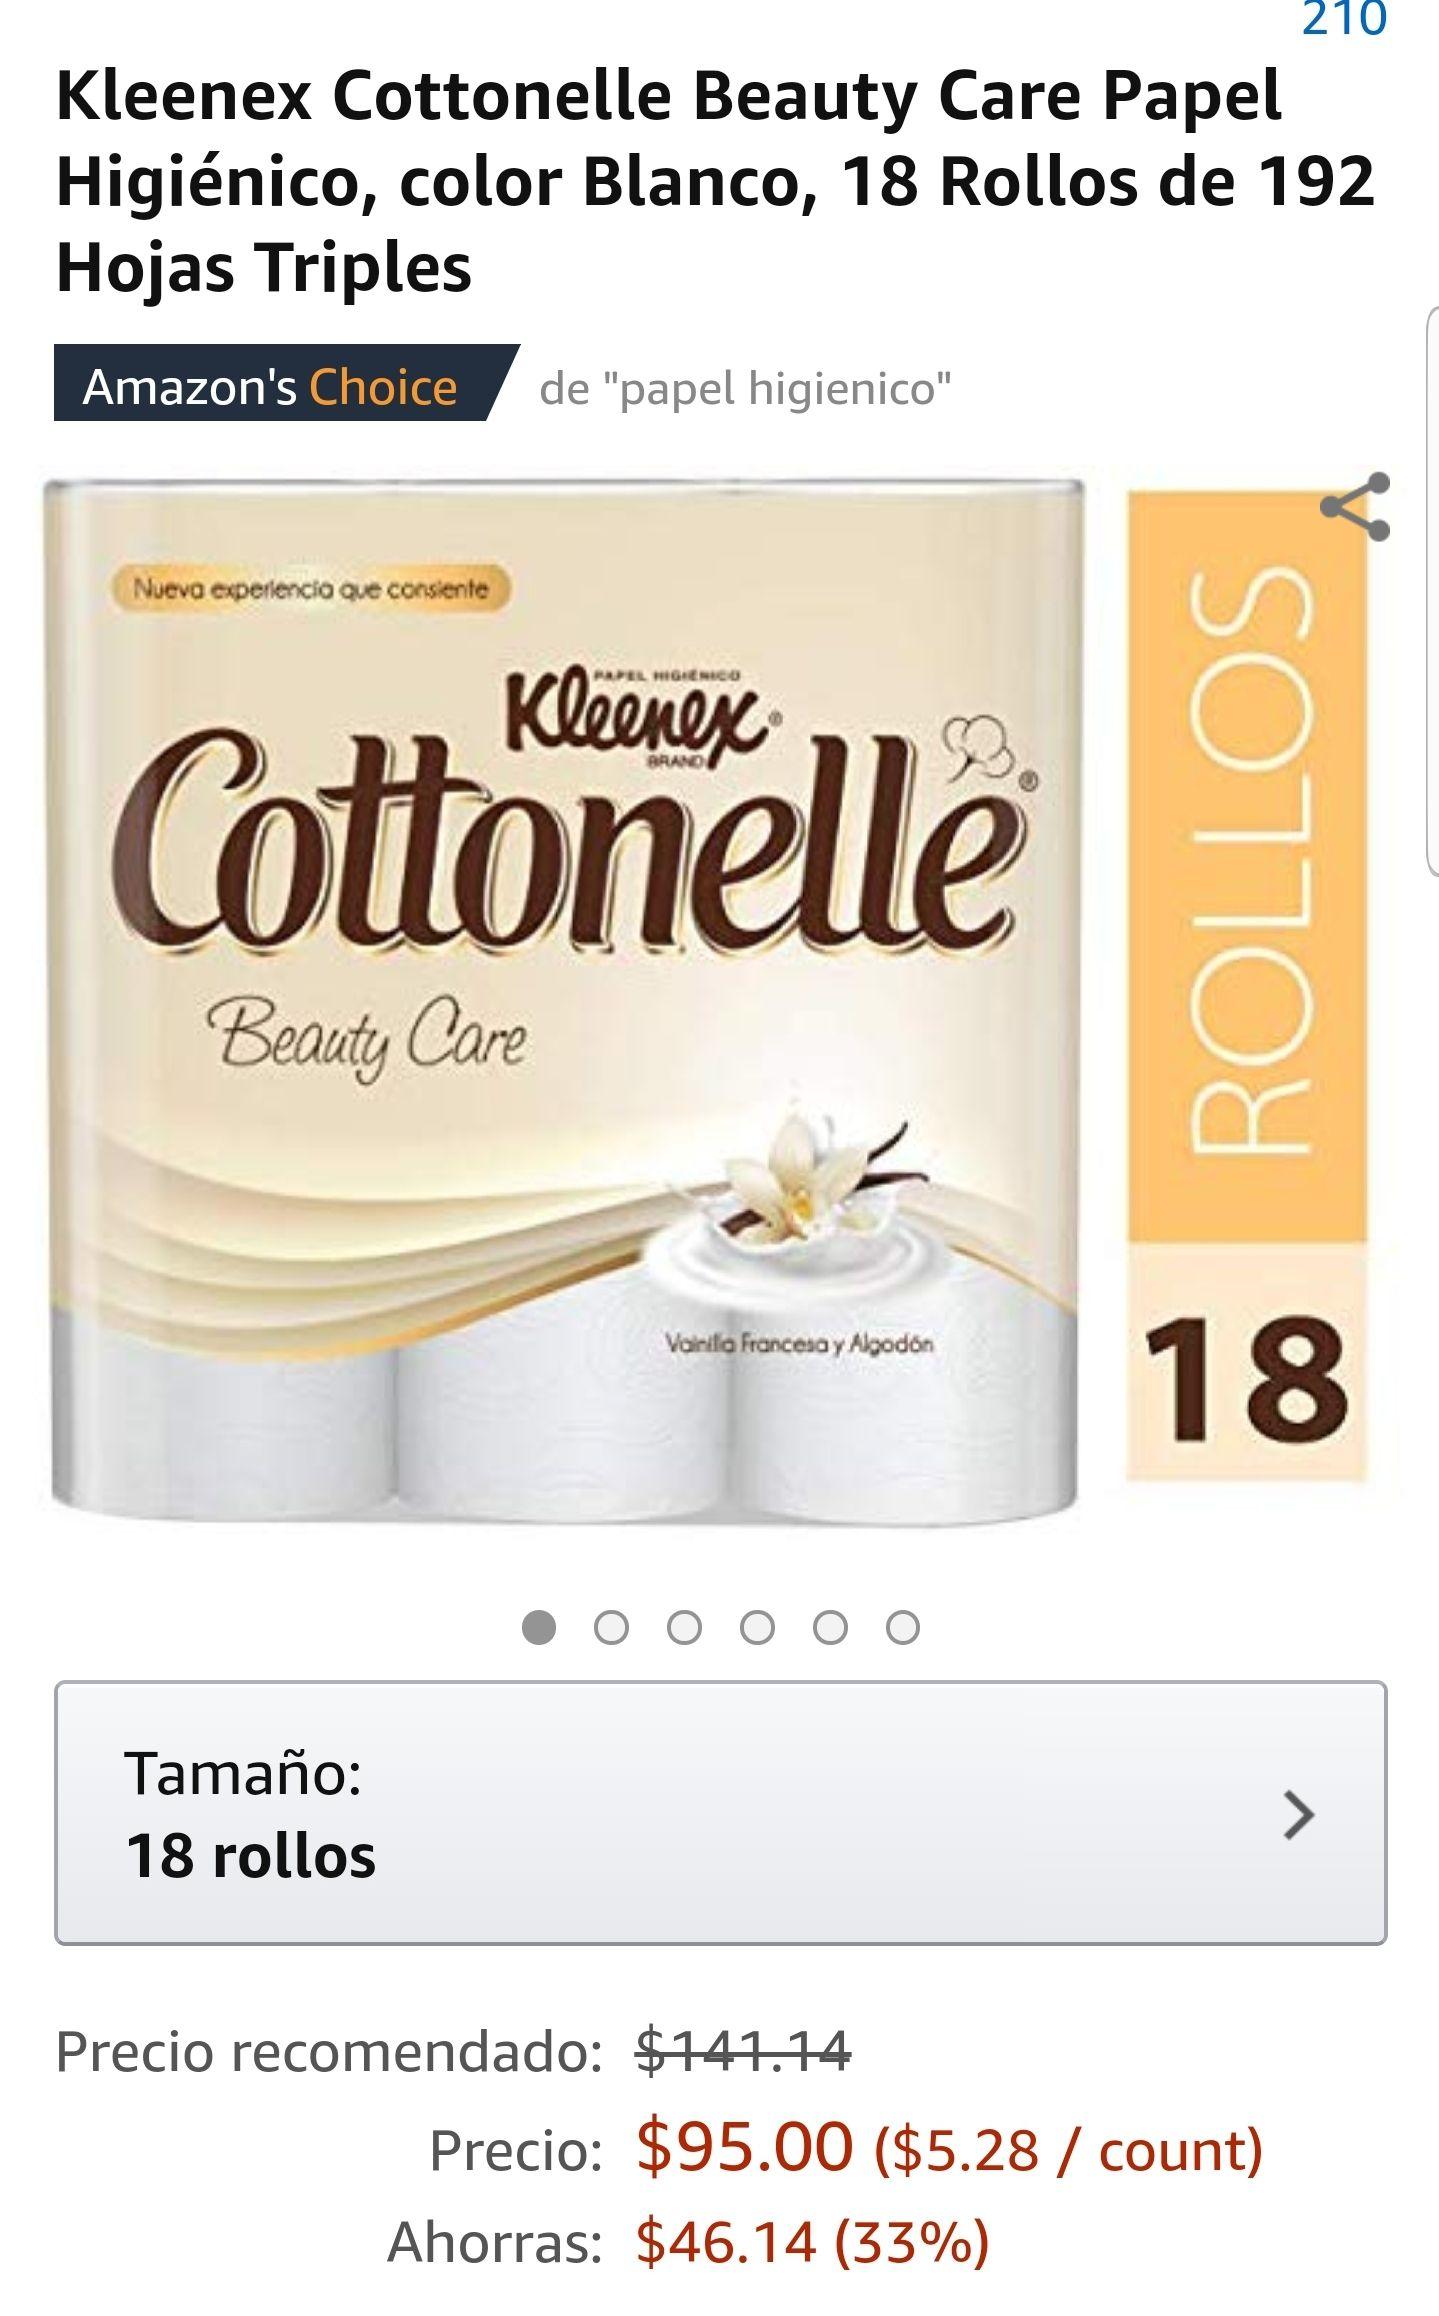 Amazon: Kleenex Cottonelle Beauty Care Papel Higiénico, color Blanco, 18 Rollos de 192 Hojas Triples